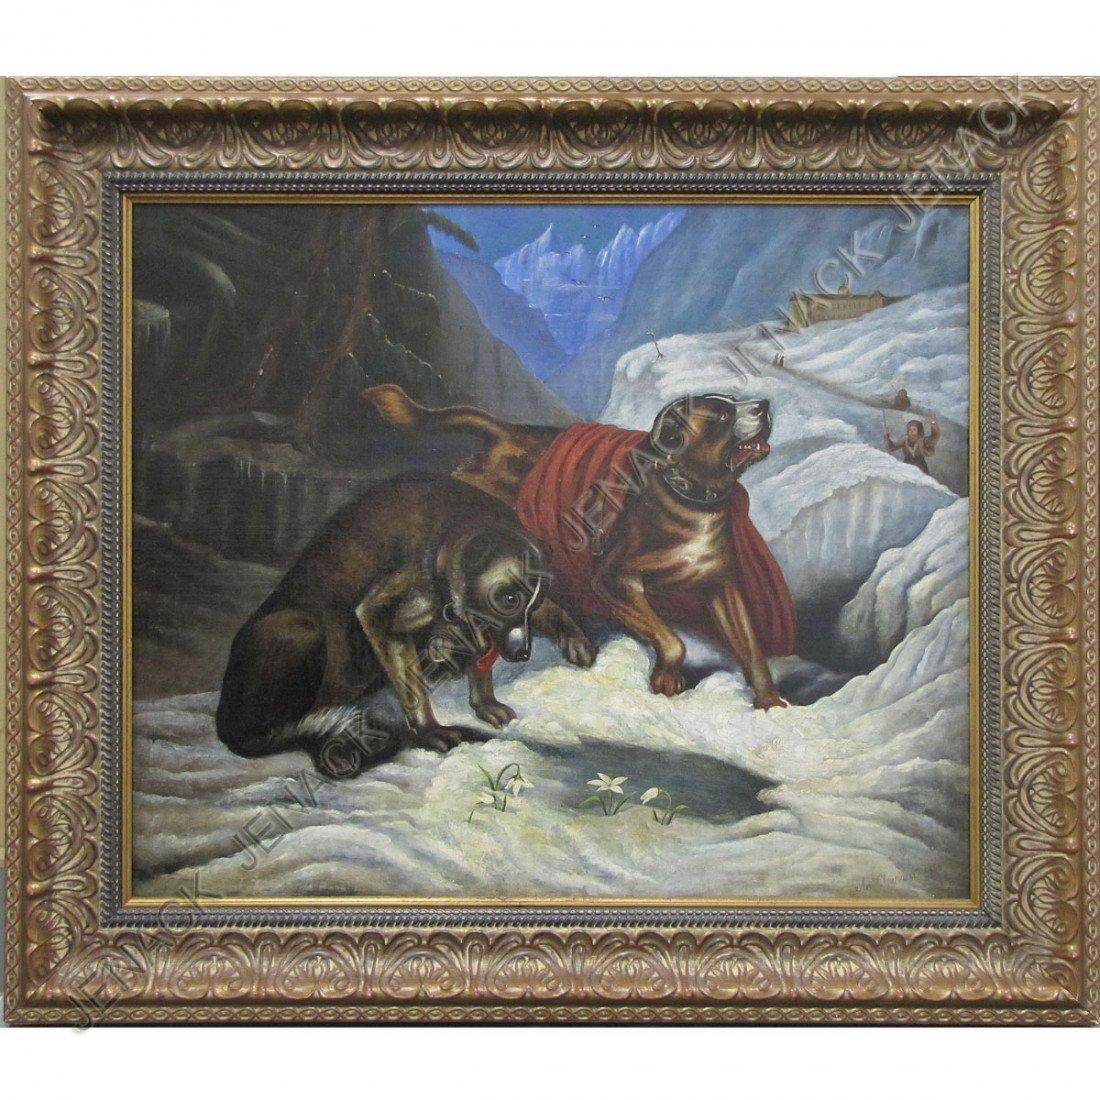 29: ANTOINE CLAVEAU (AMERICAN 1815-1872), OIL